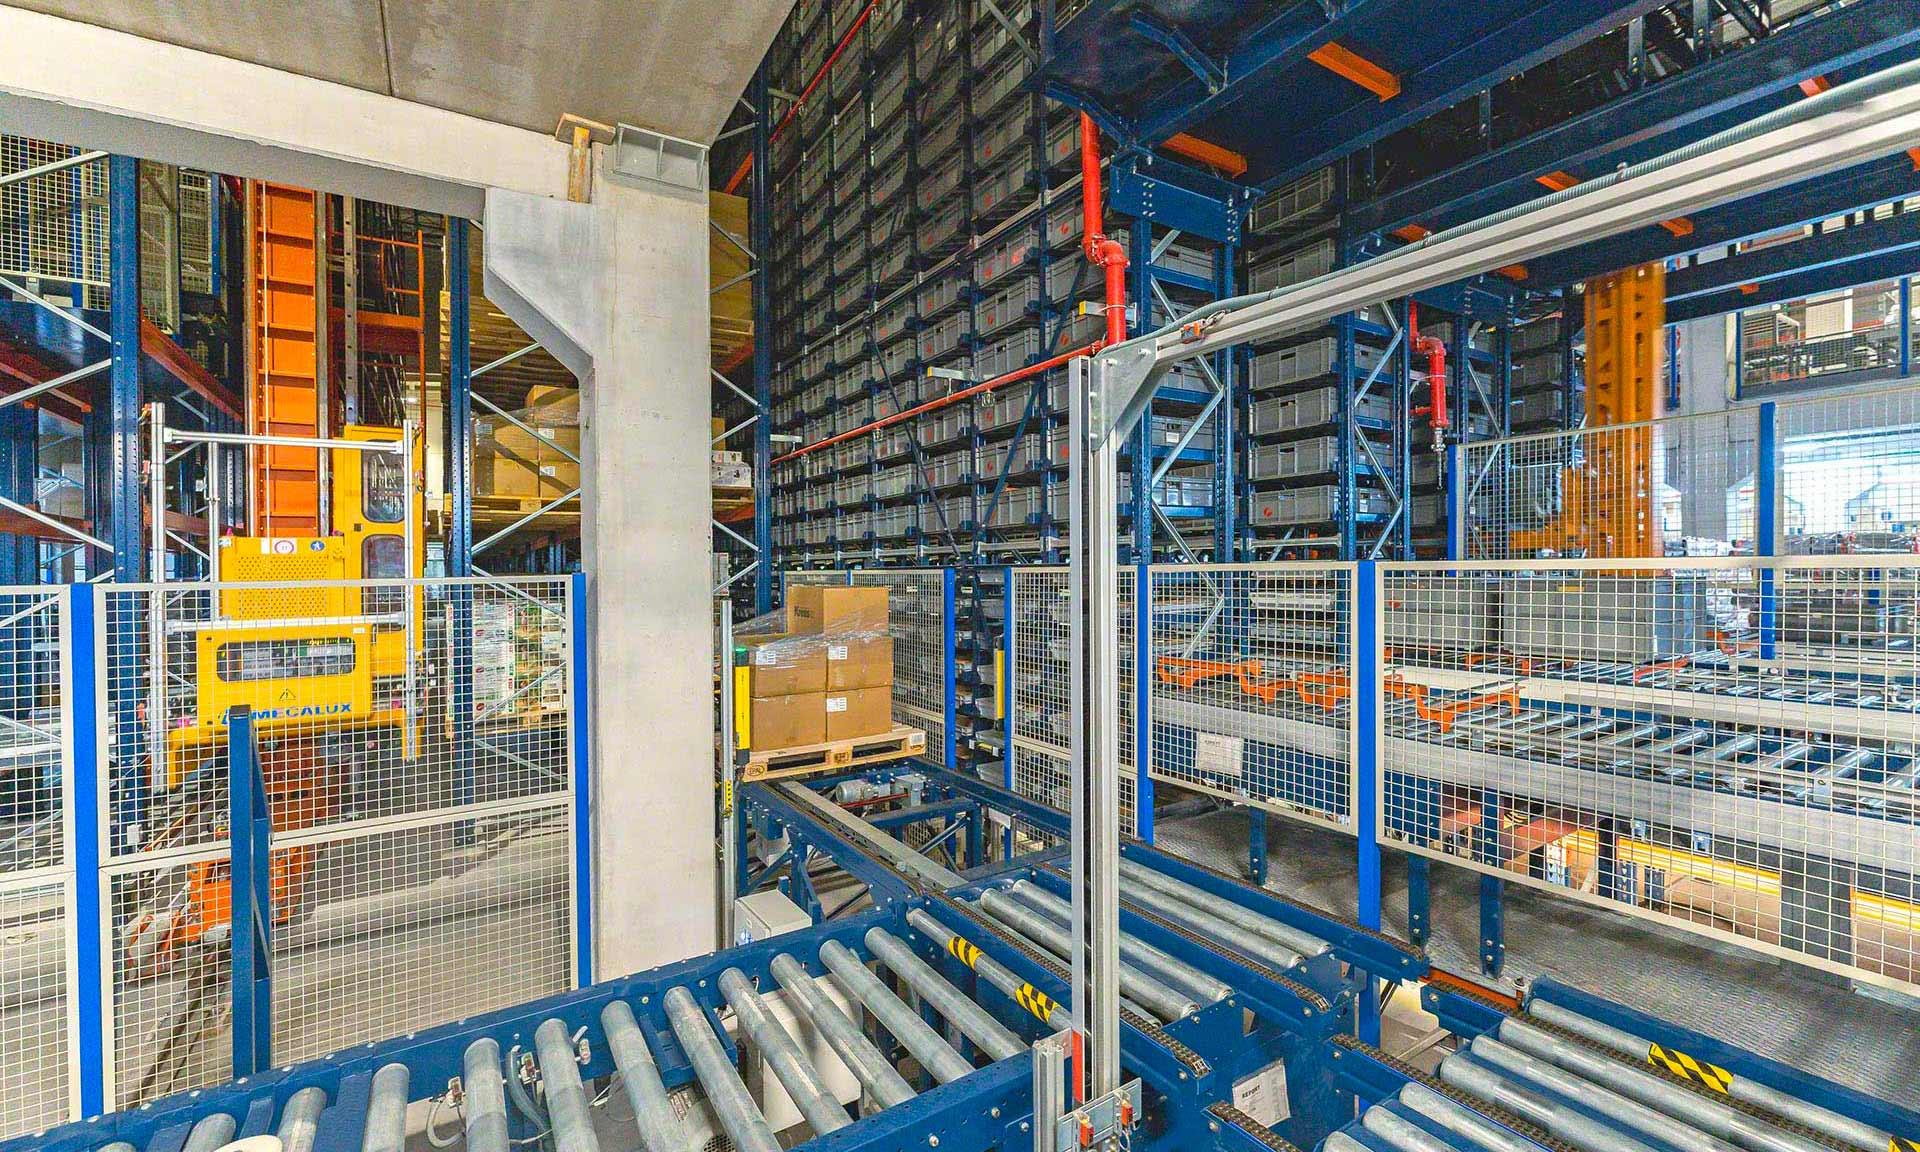 Aghasa Turis: tripled storage capacity and a 27% increase in prepared orders